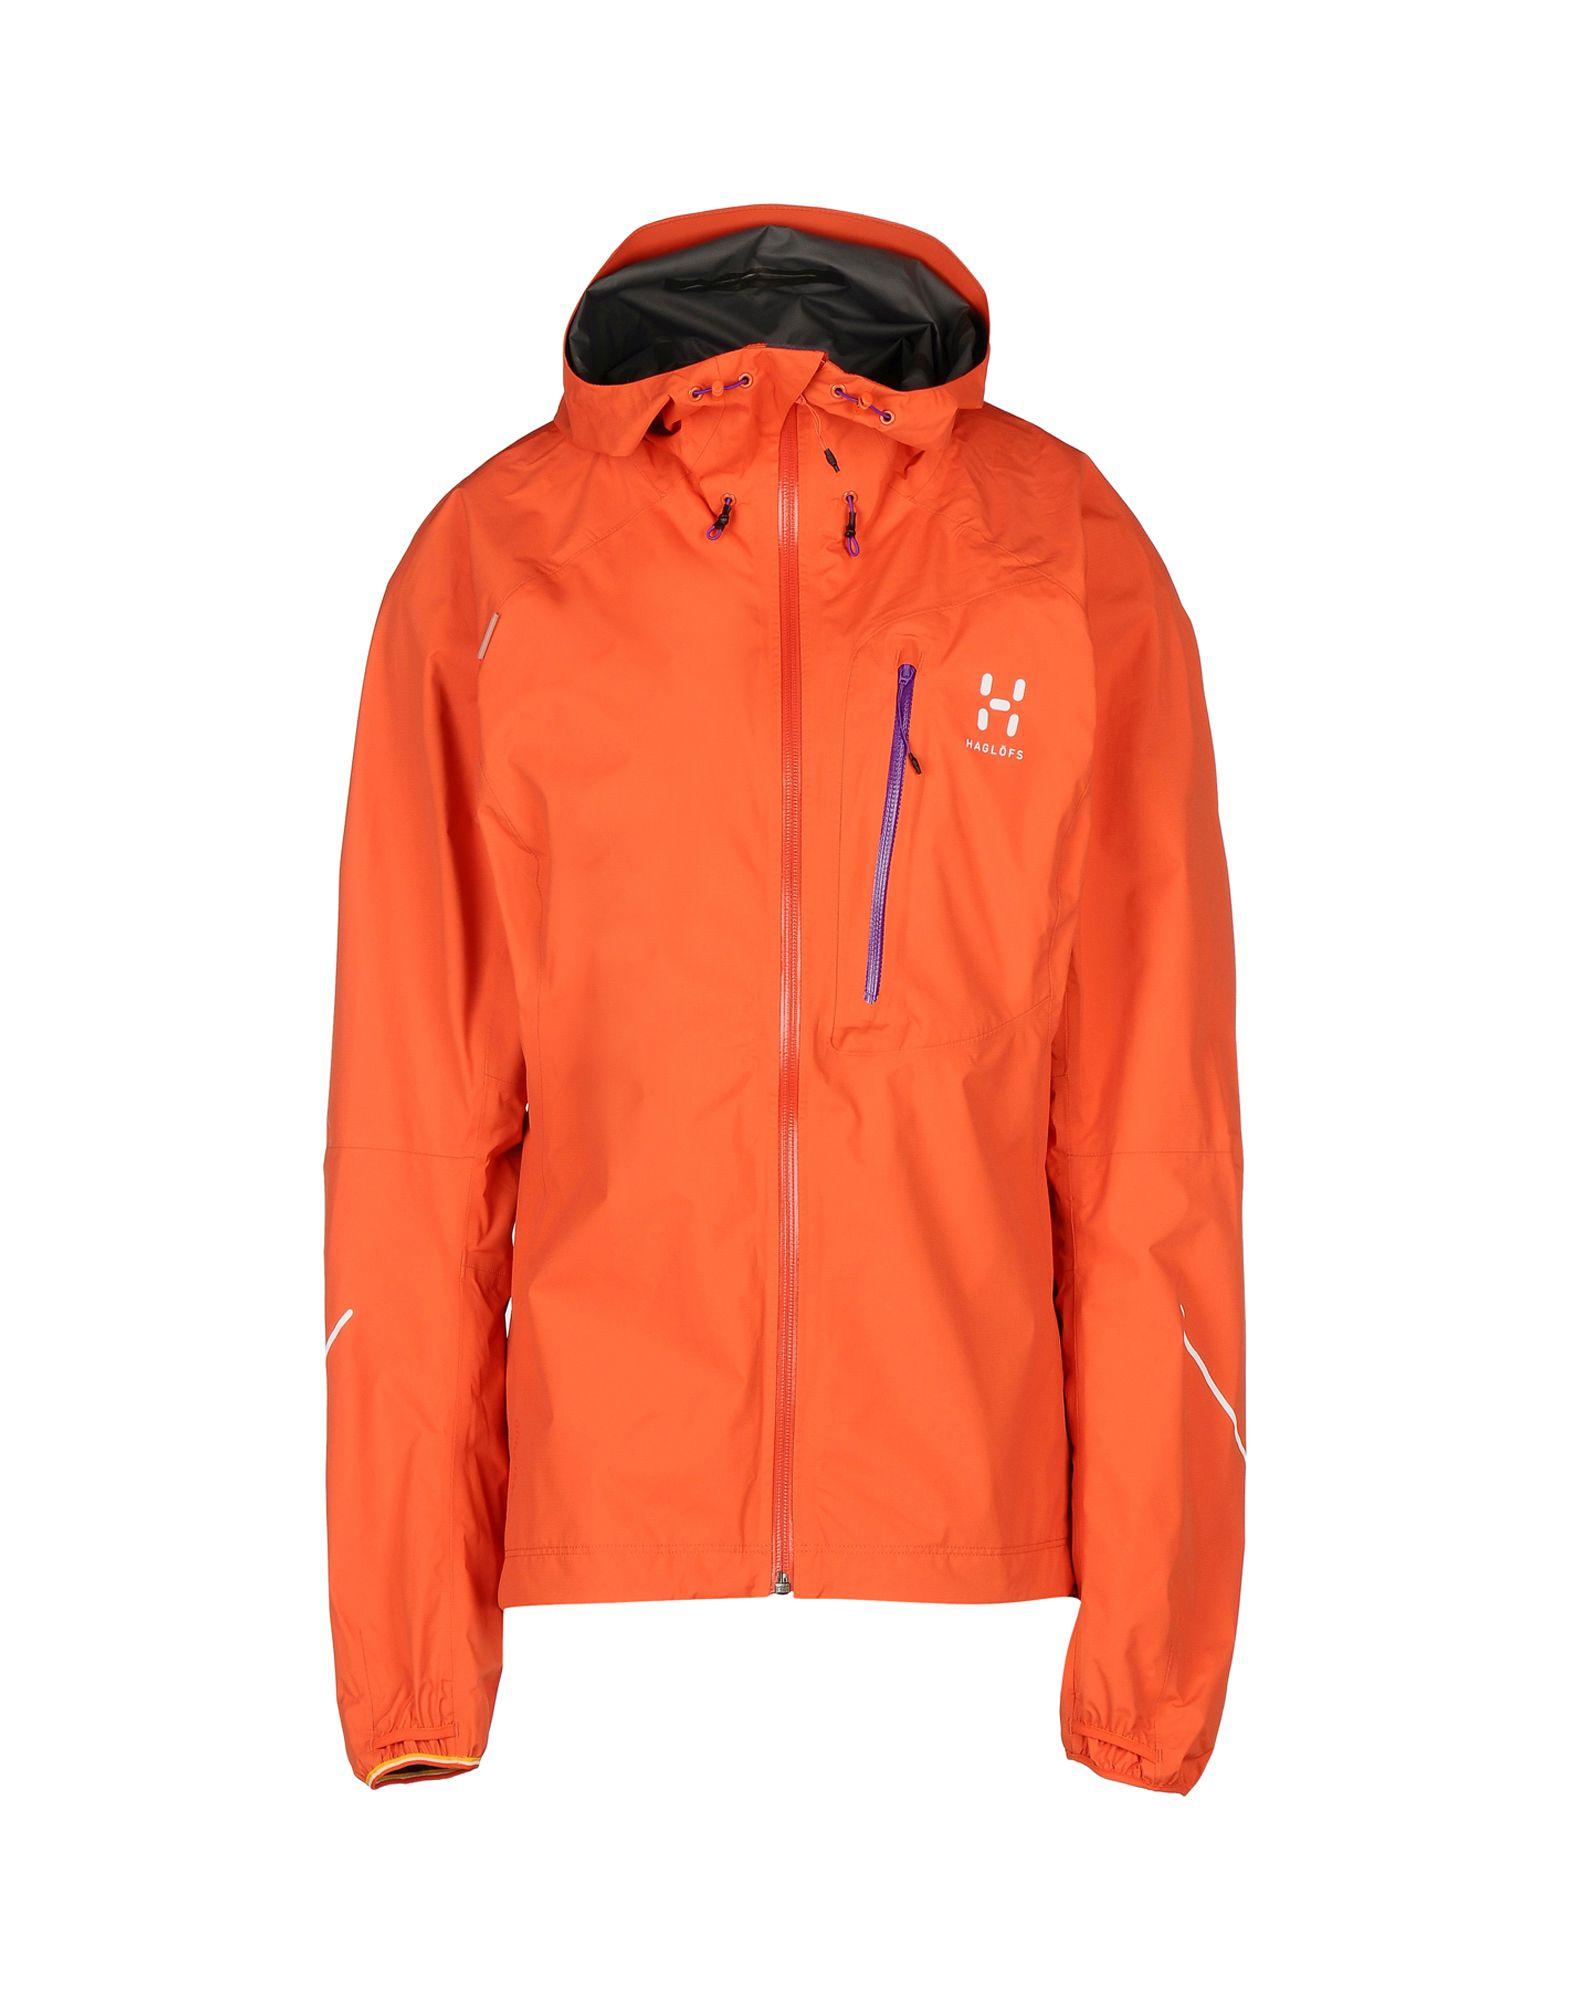 Haglöfs Paclite Homme Goretex Blouson Jacket Iii Lim nwOX08kP